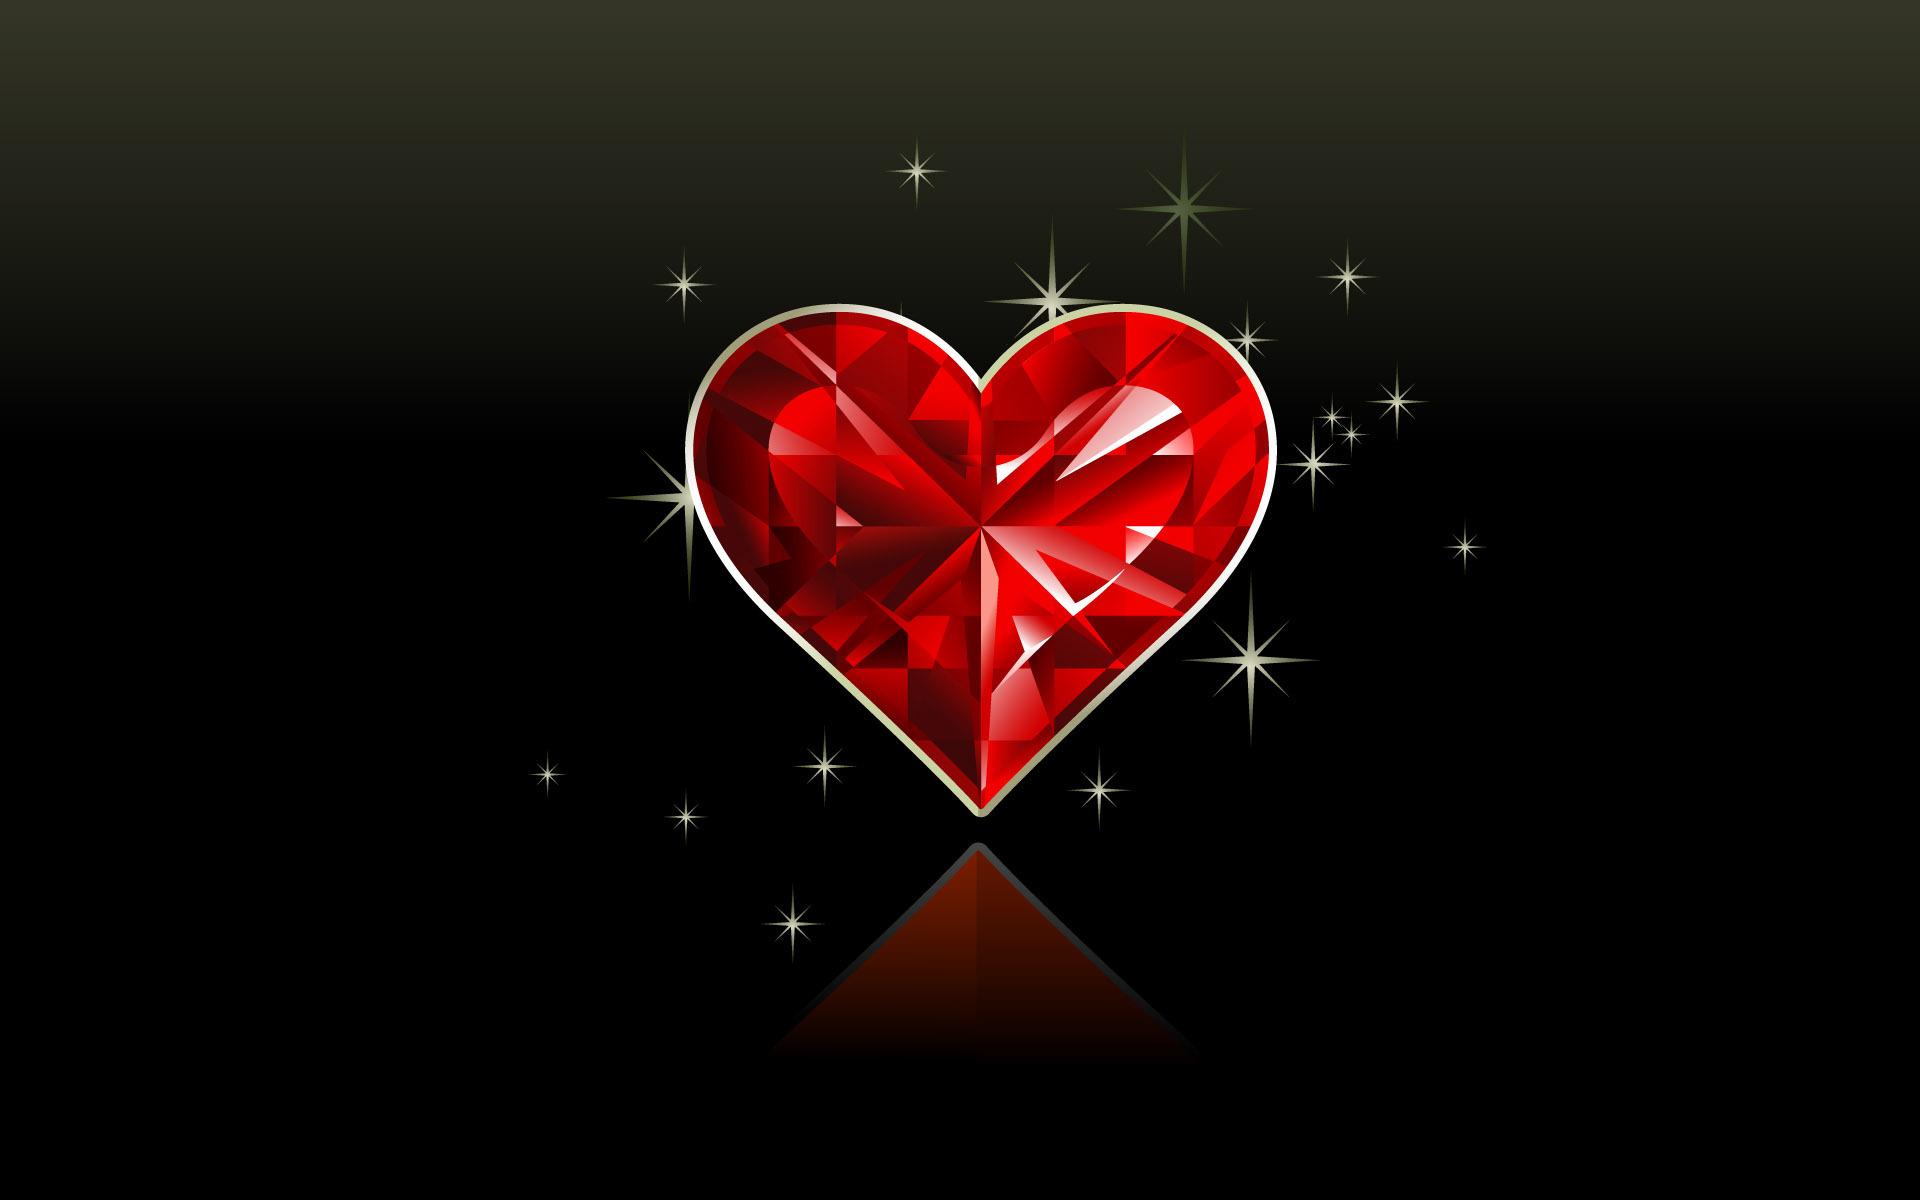 Love Heart Wallpaper Hd: Cool Love Wallpapers